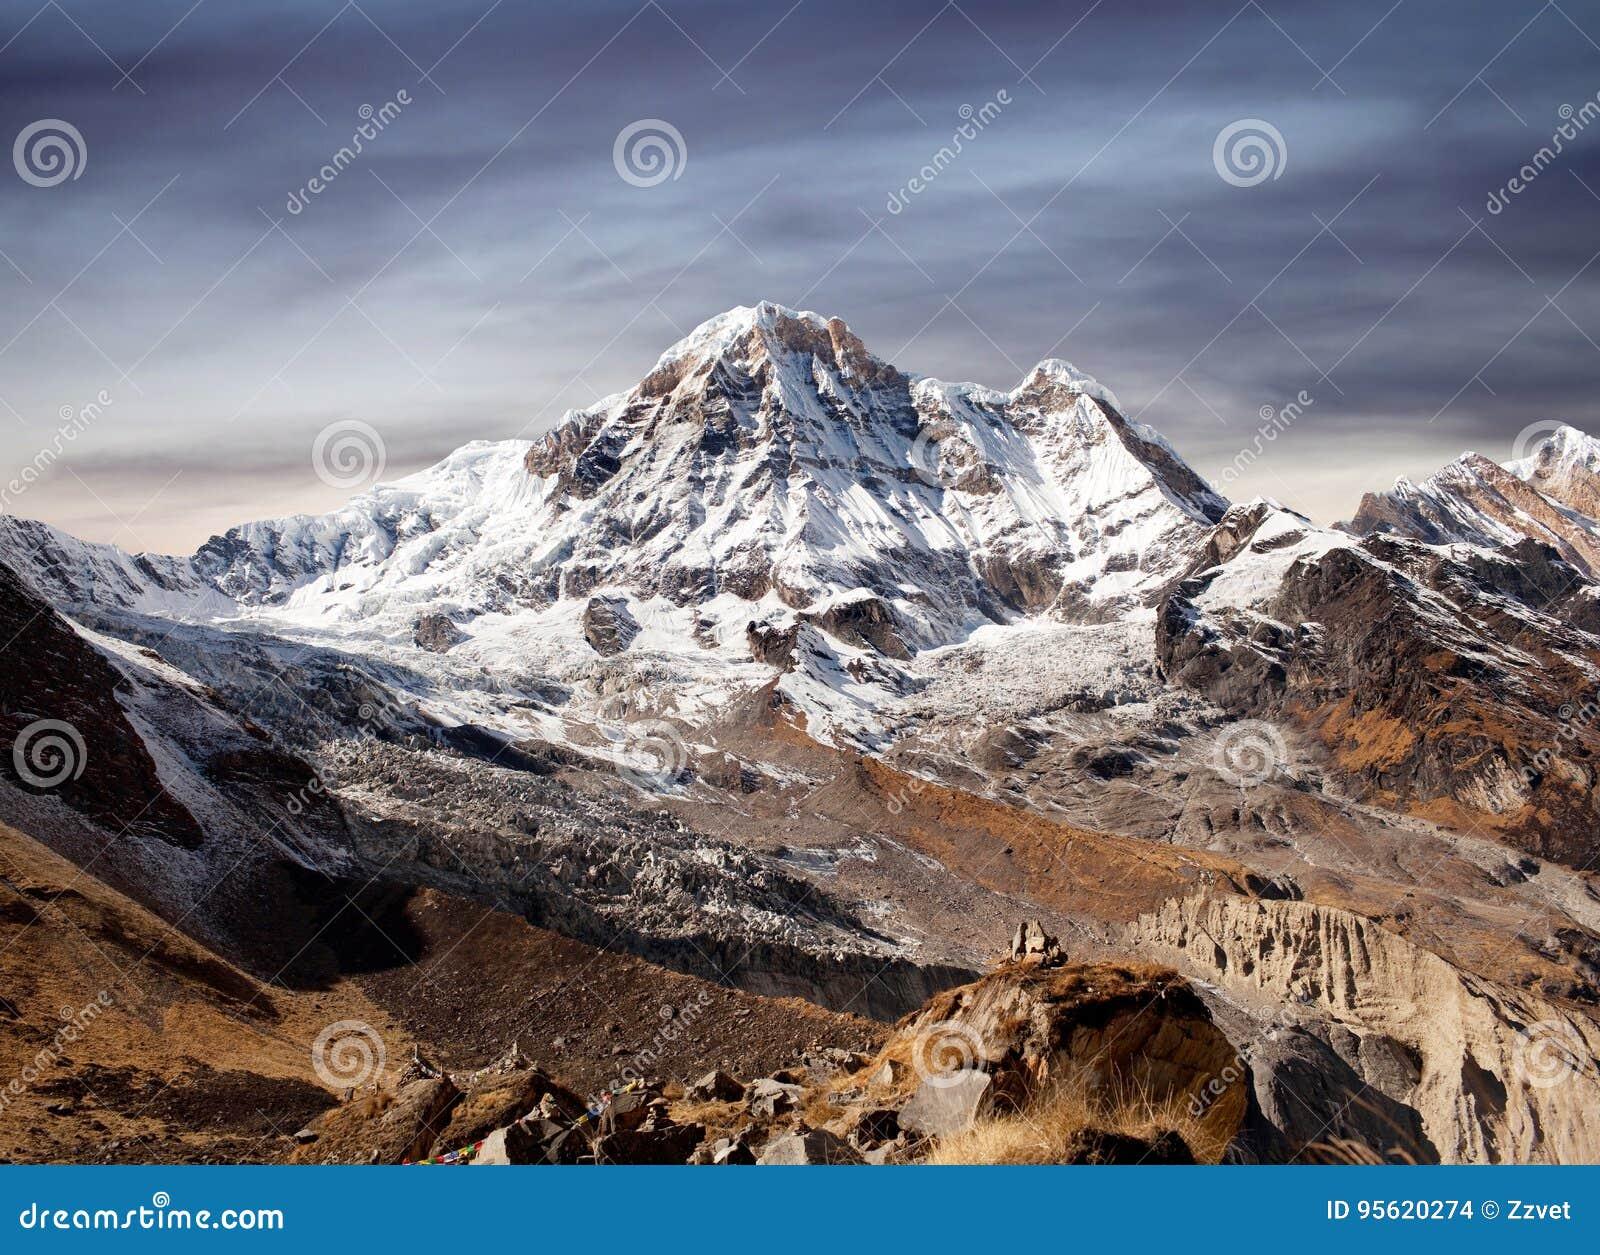 Annapurna South peak in Nepal Himalaya